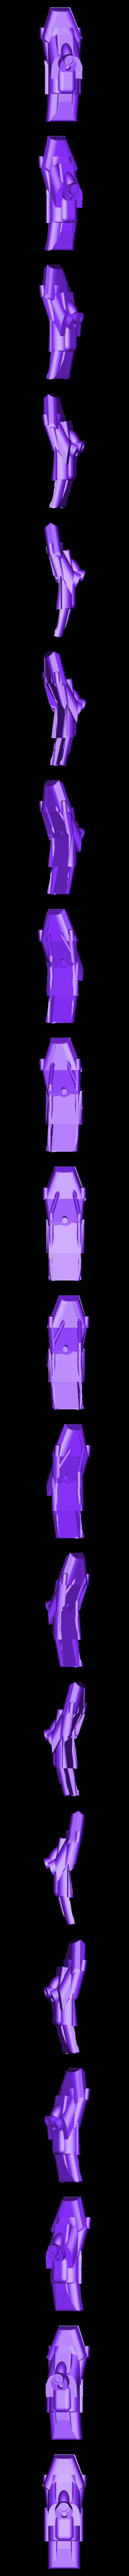 kappen-voor.stl Download free STL file quad (custom) • 3D printing design, jasperbaudoin